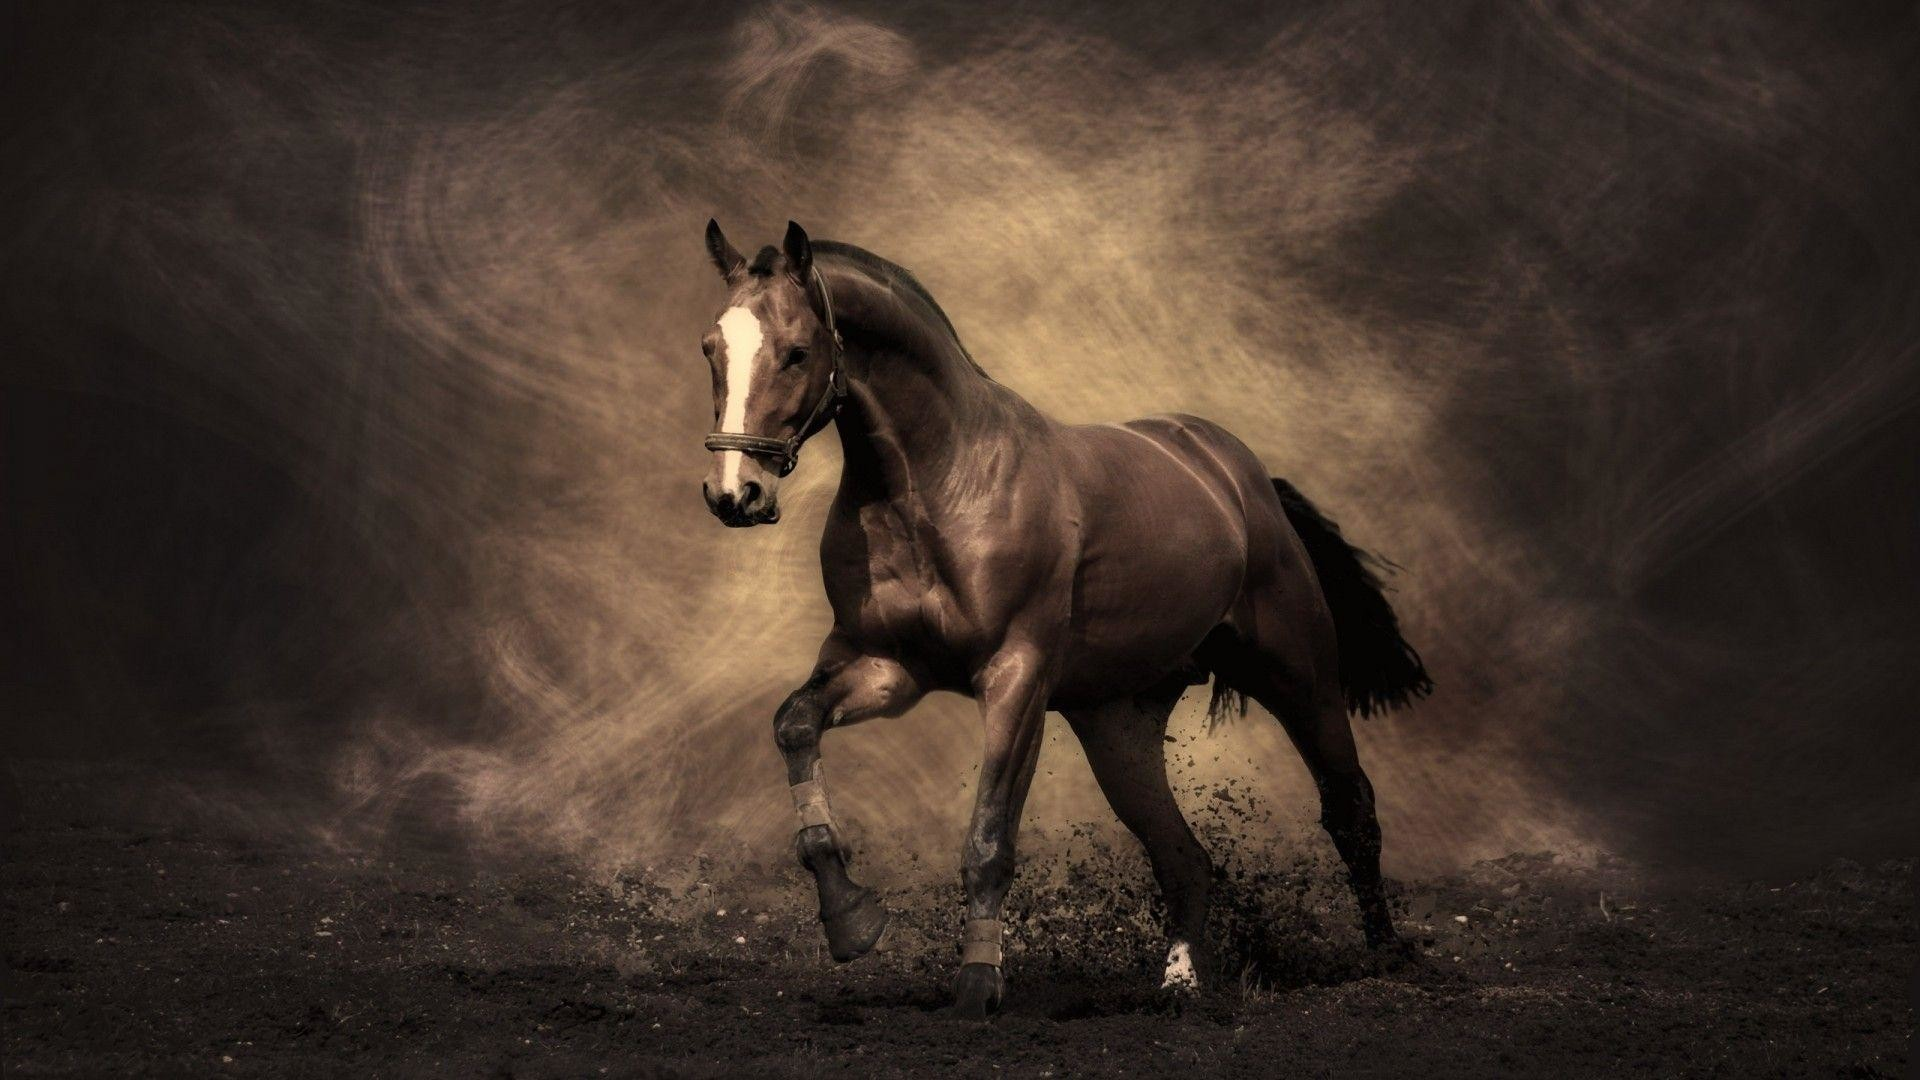 Arabian Racing Horse Desktop   High Quality Wallpapers,Wallpaper .